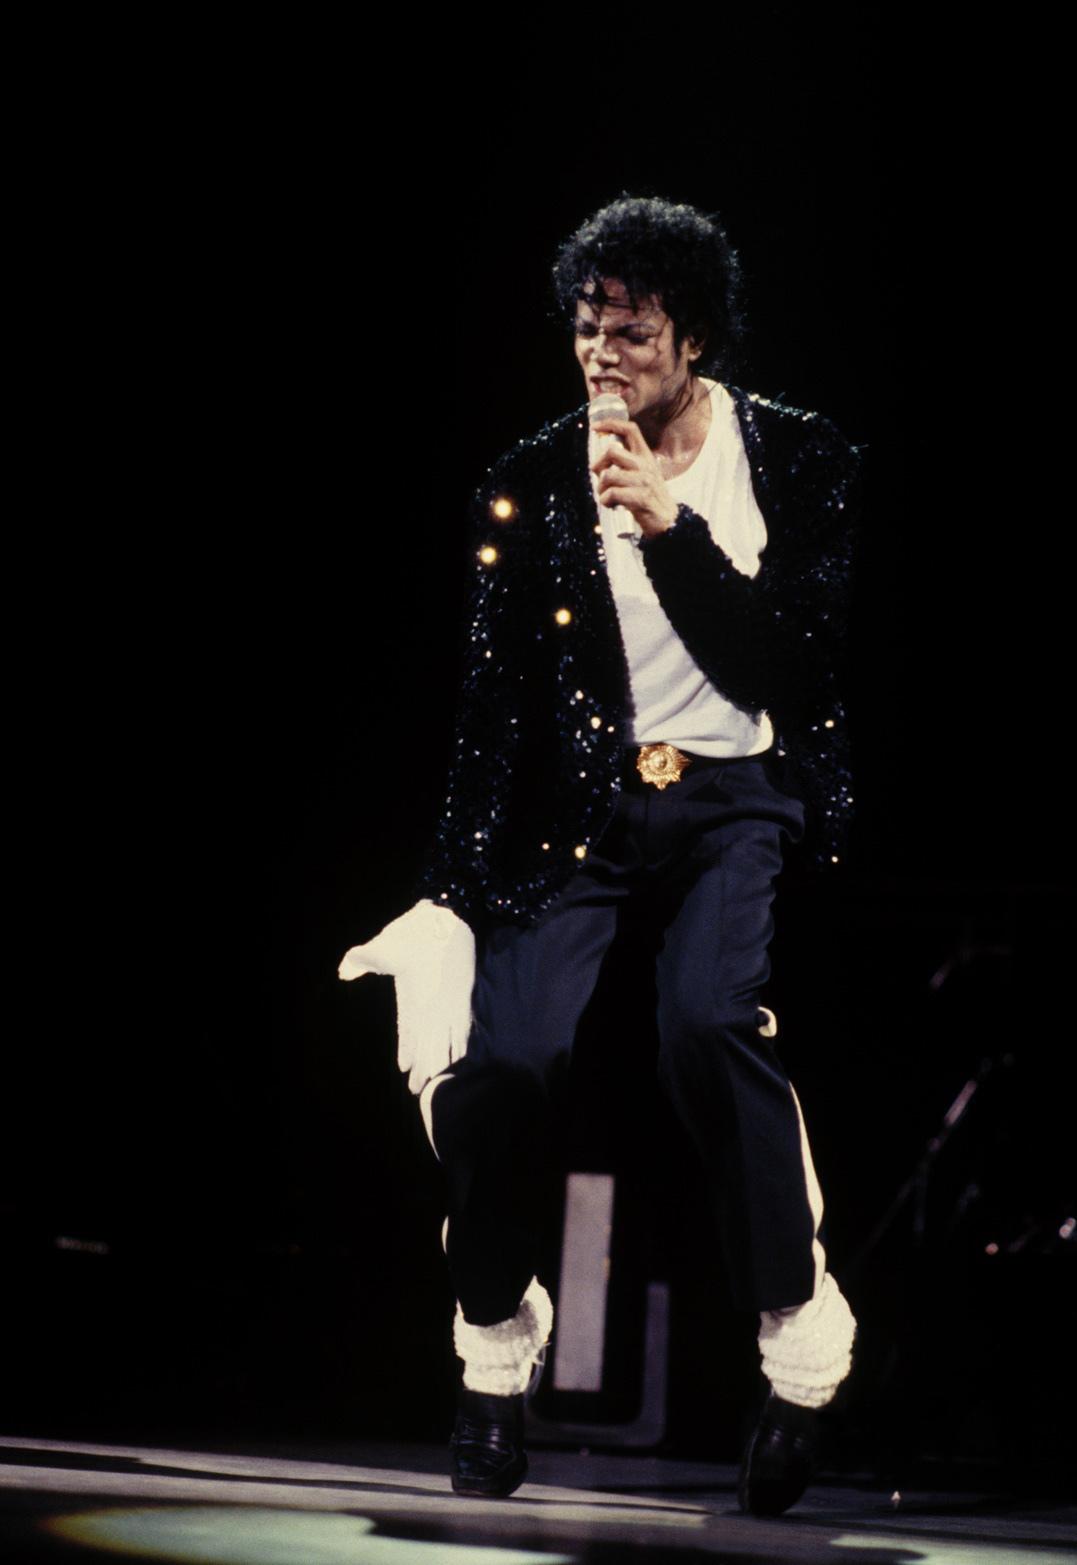 Bad, Badder - The Bad World Tour *Billie Jean*